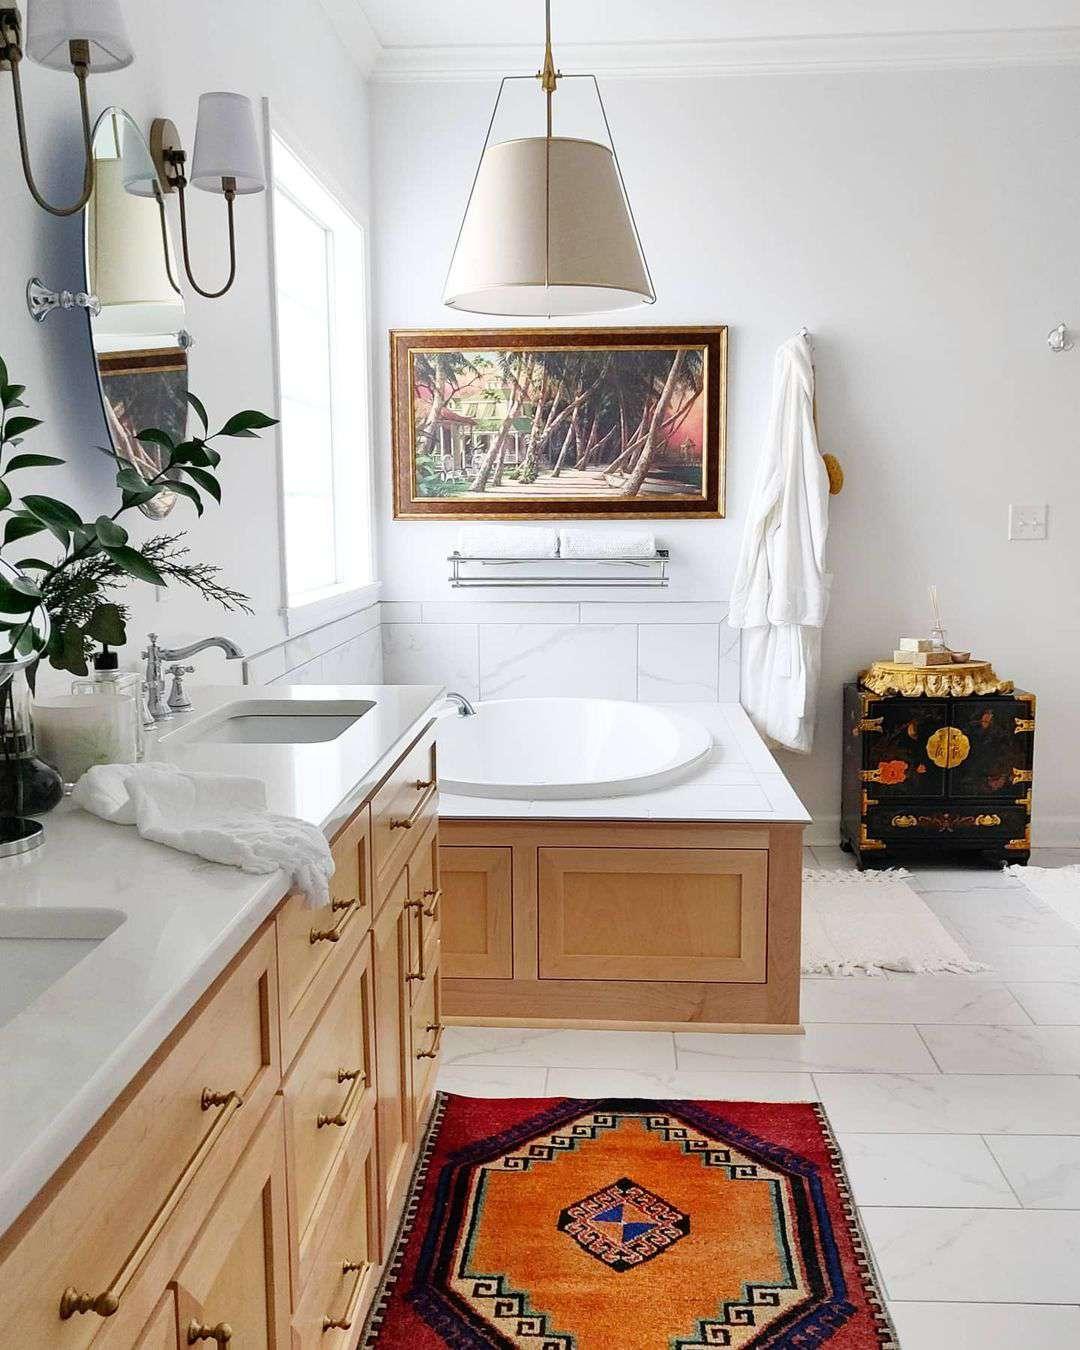 bathroom with vintage details